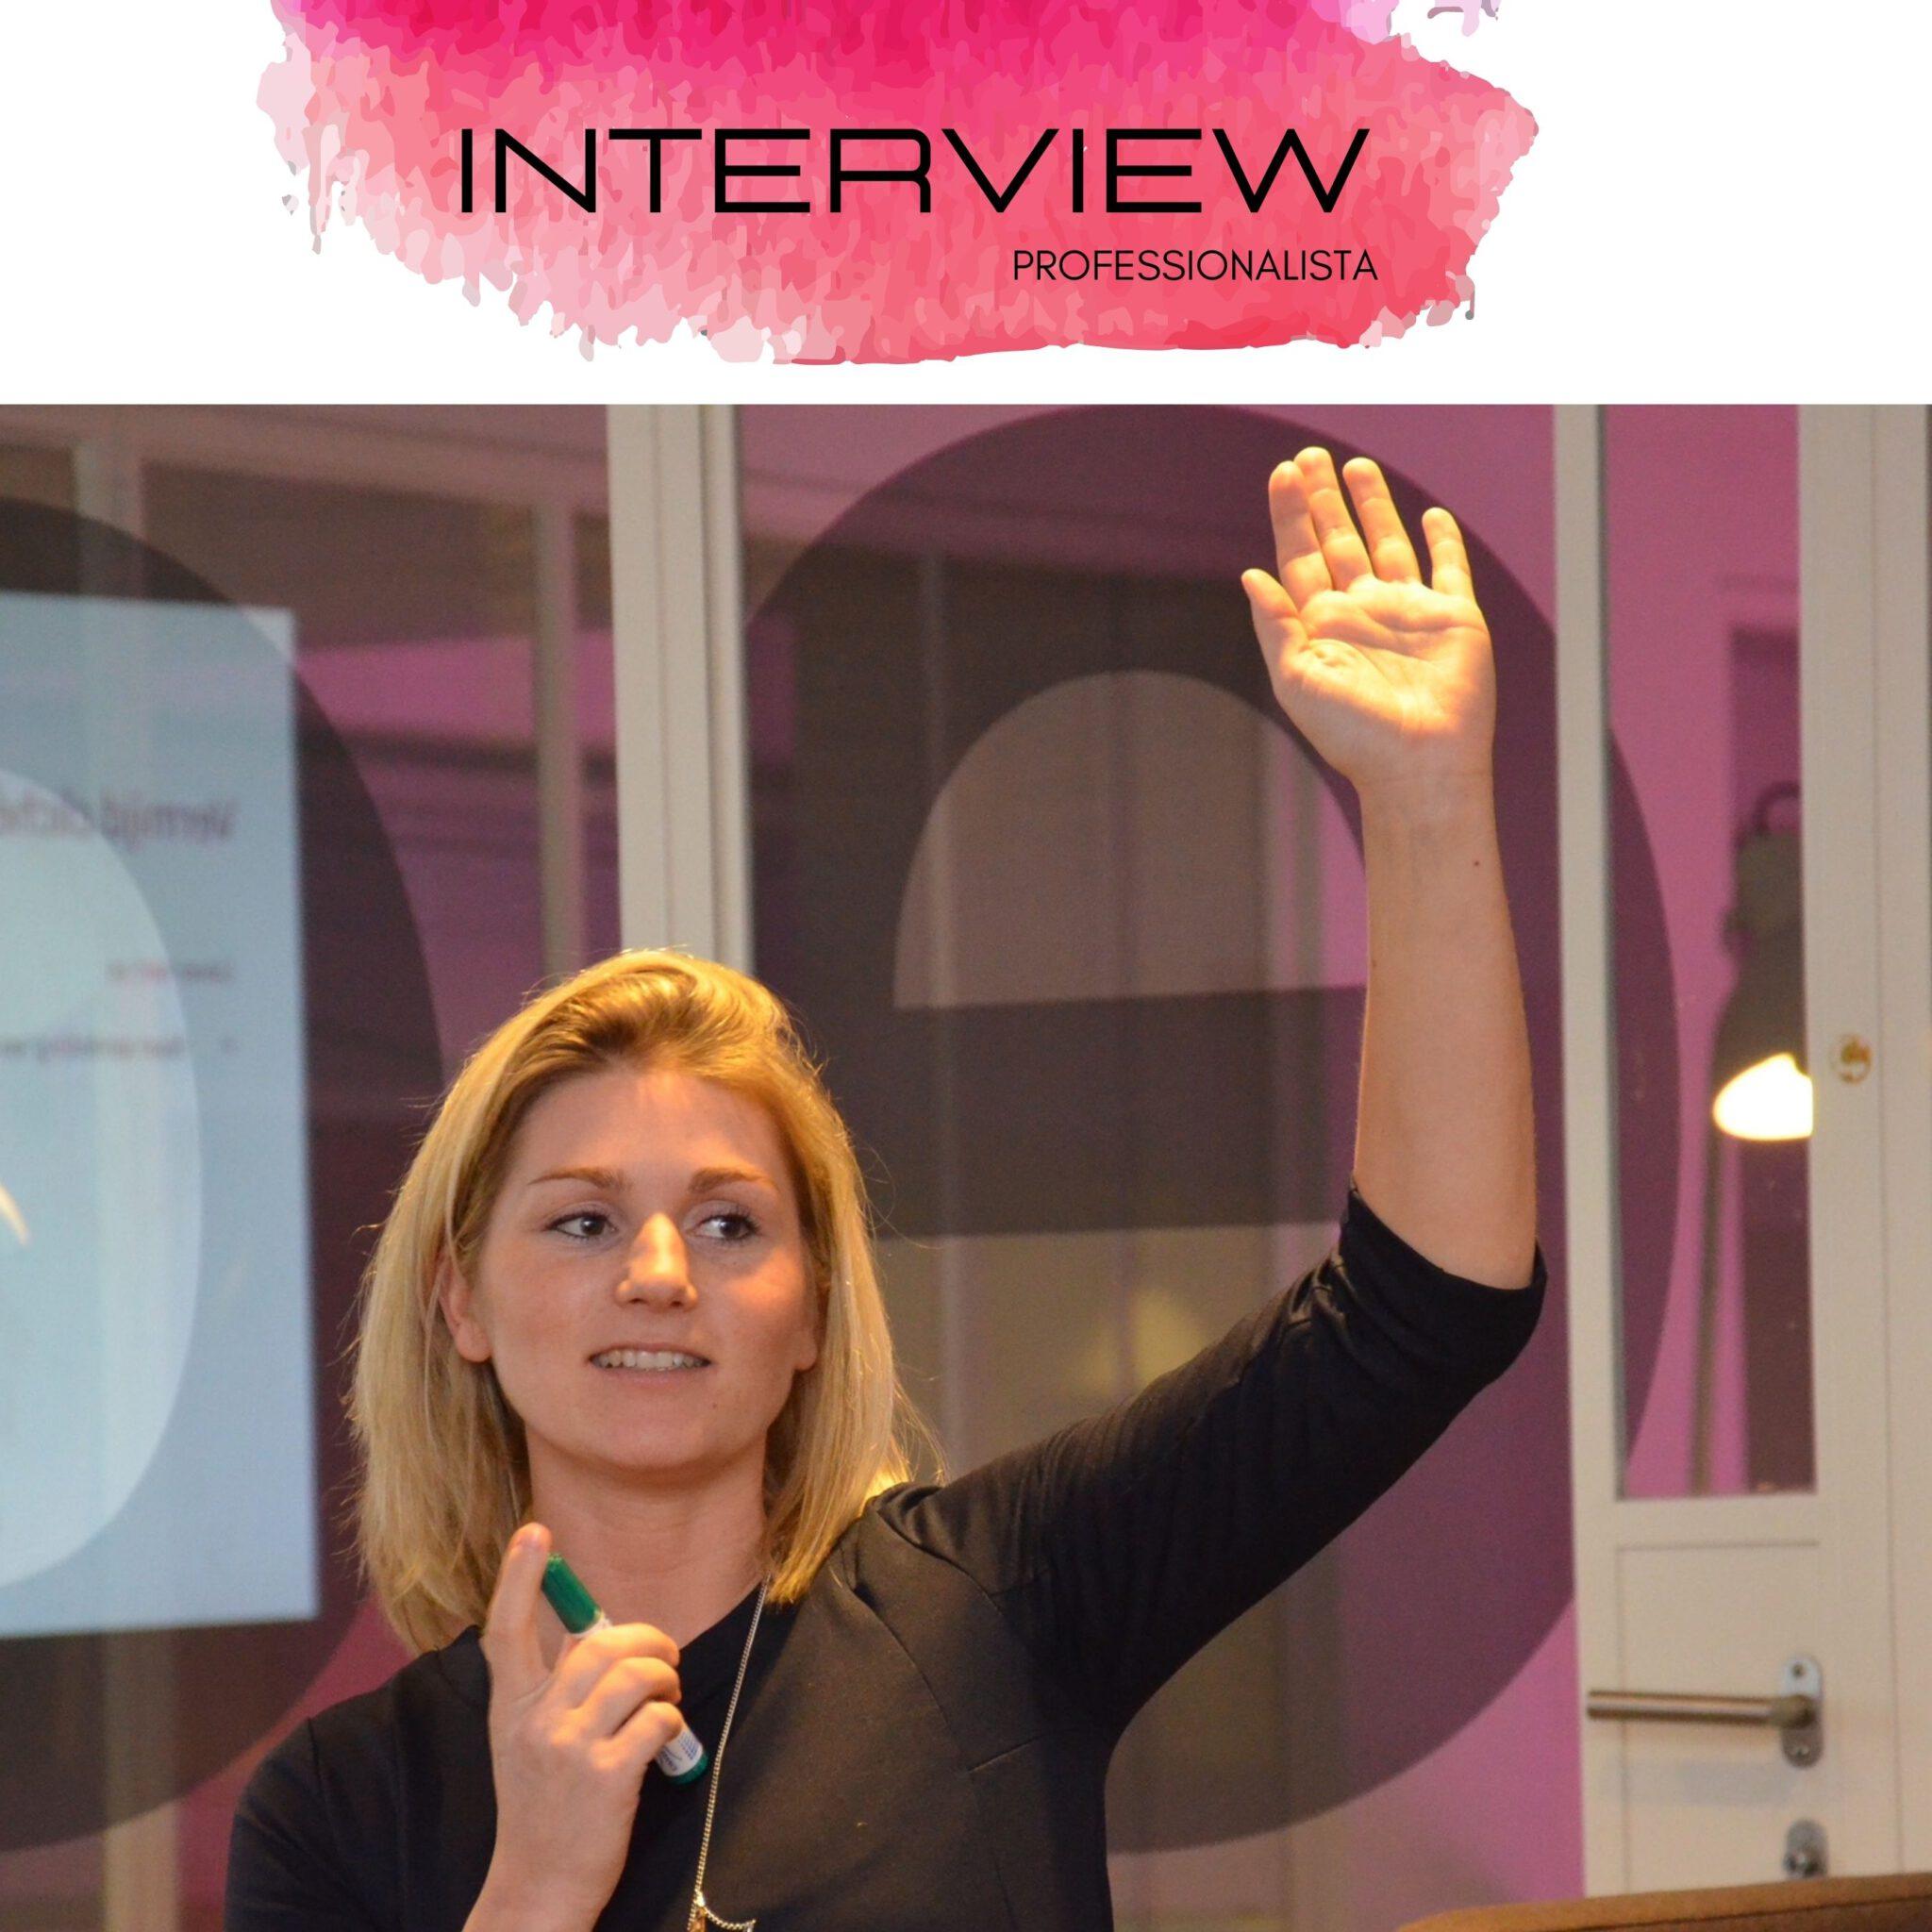 Interview Professionalista Alette den Exter